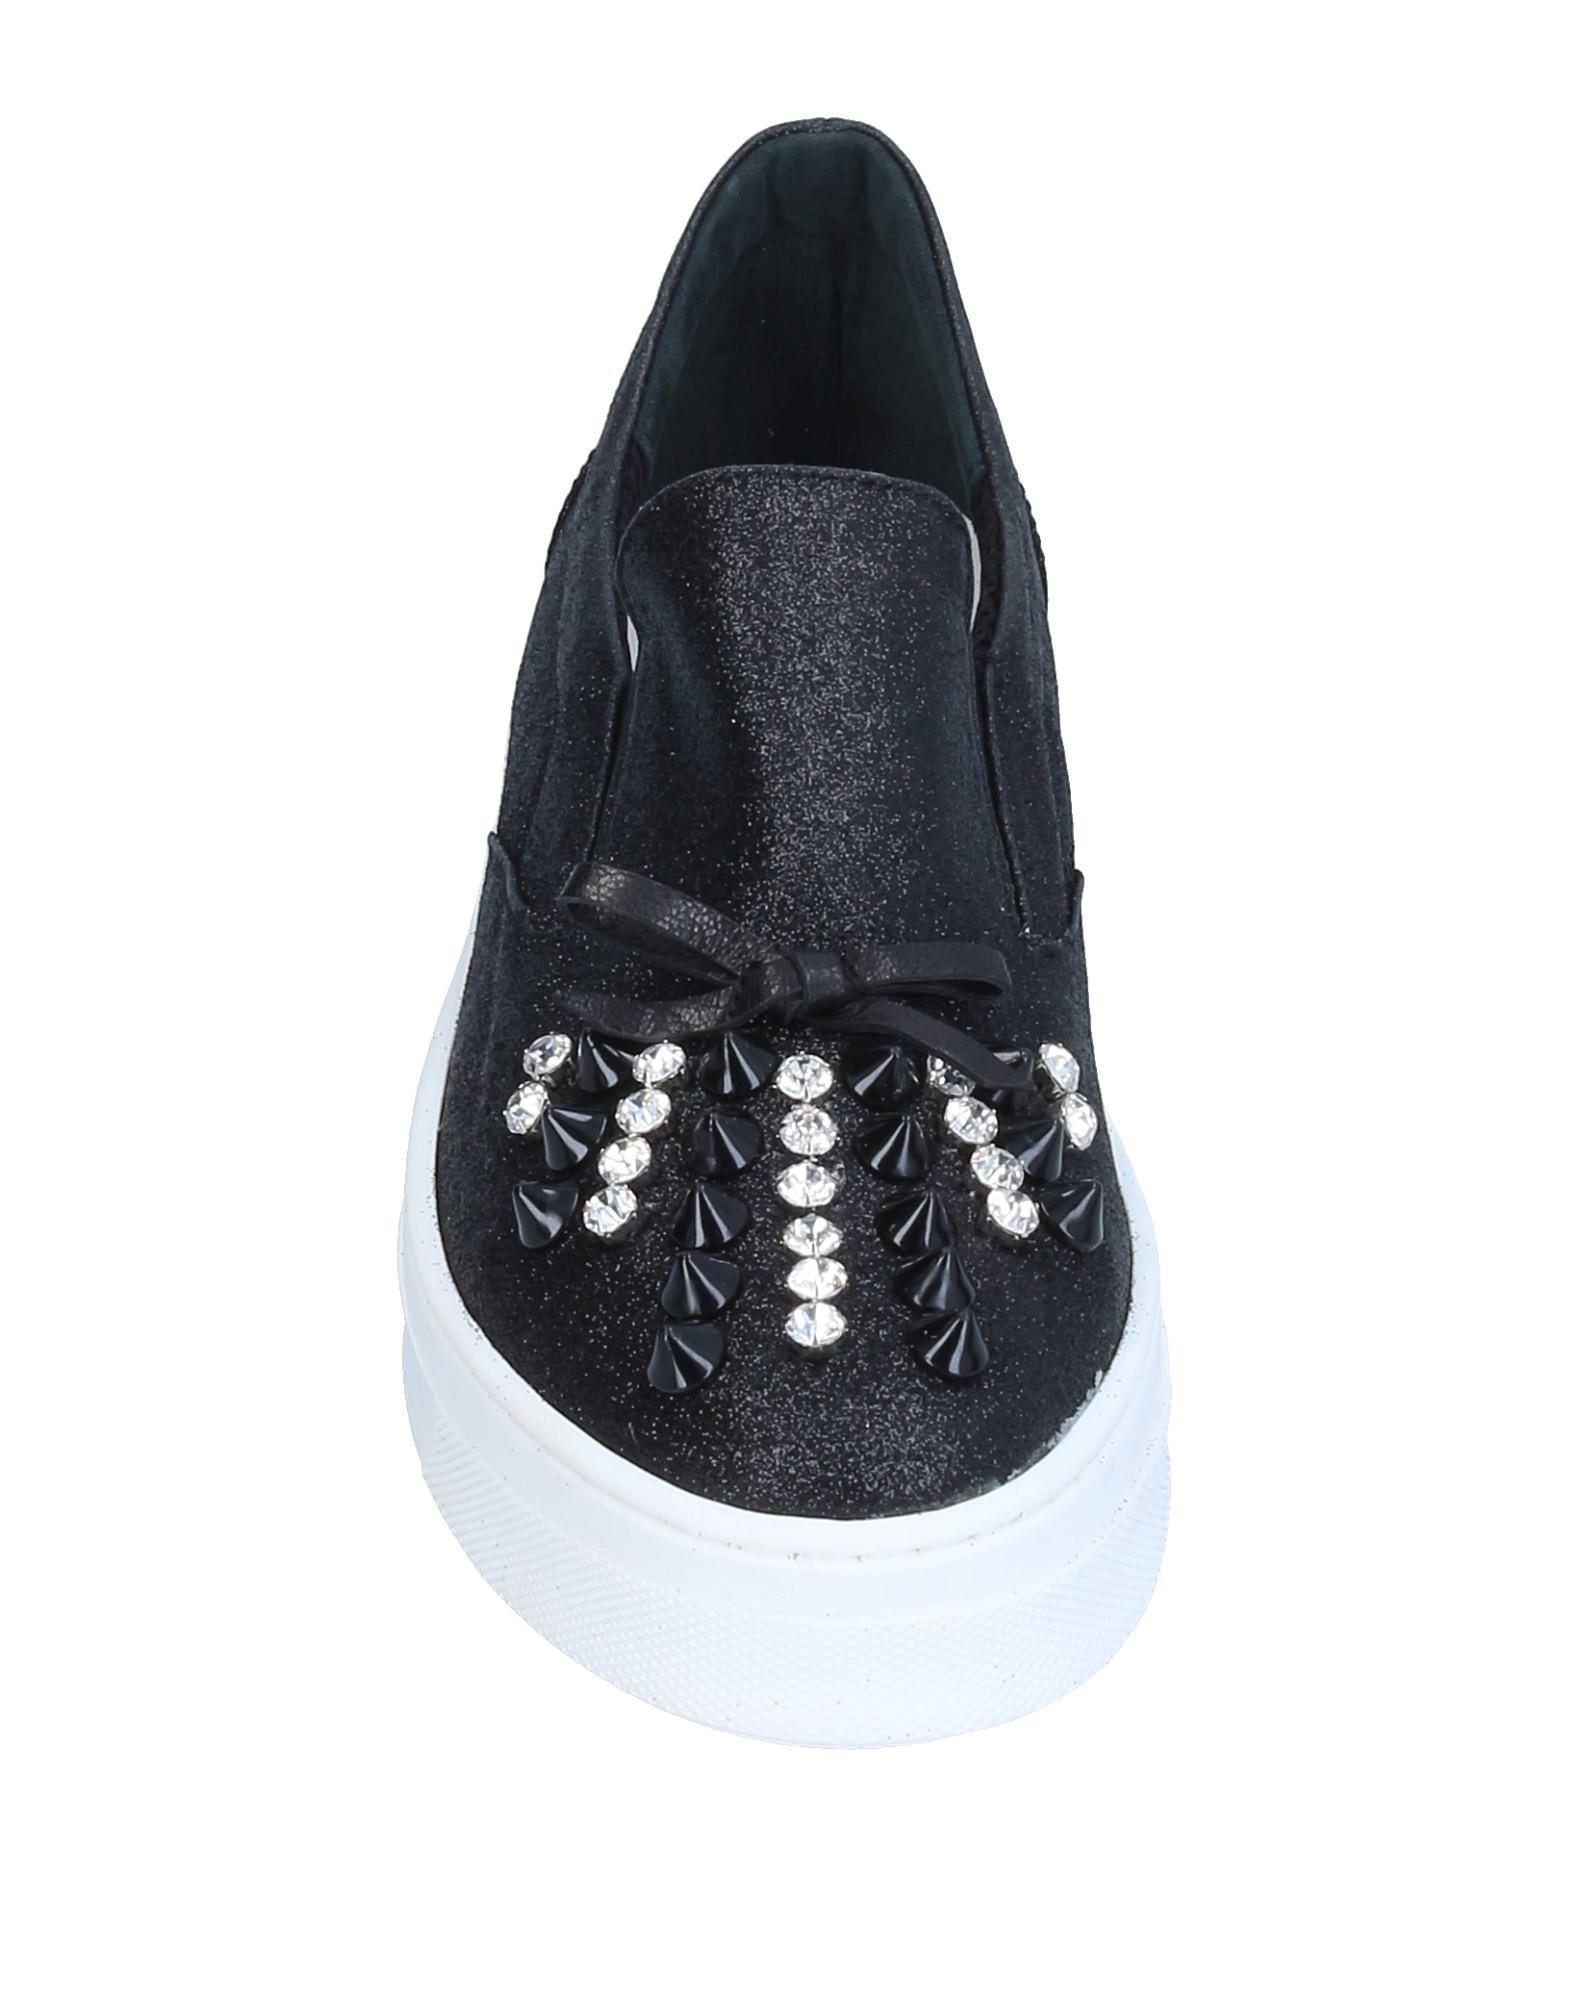 Giancarlo Paoli Low-tops & Sneakers in Black